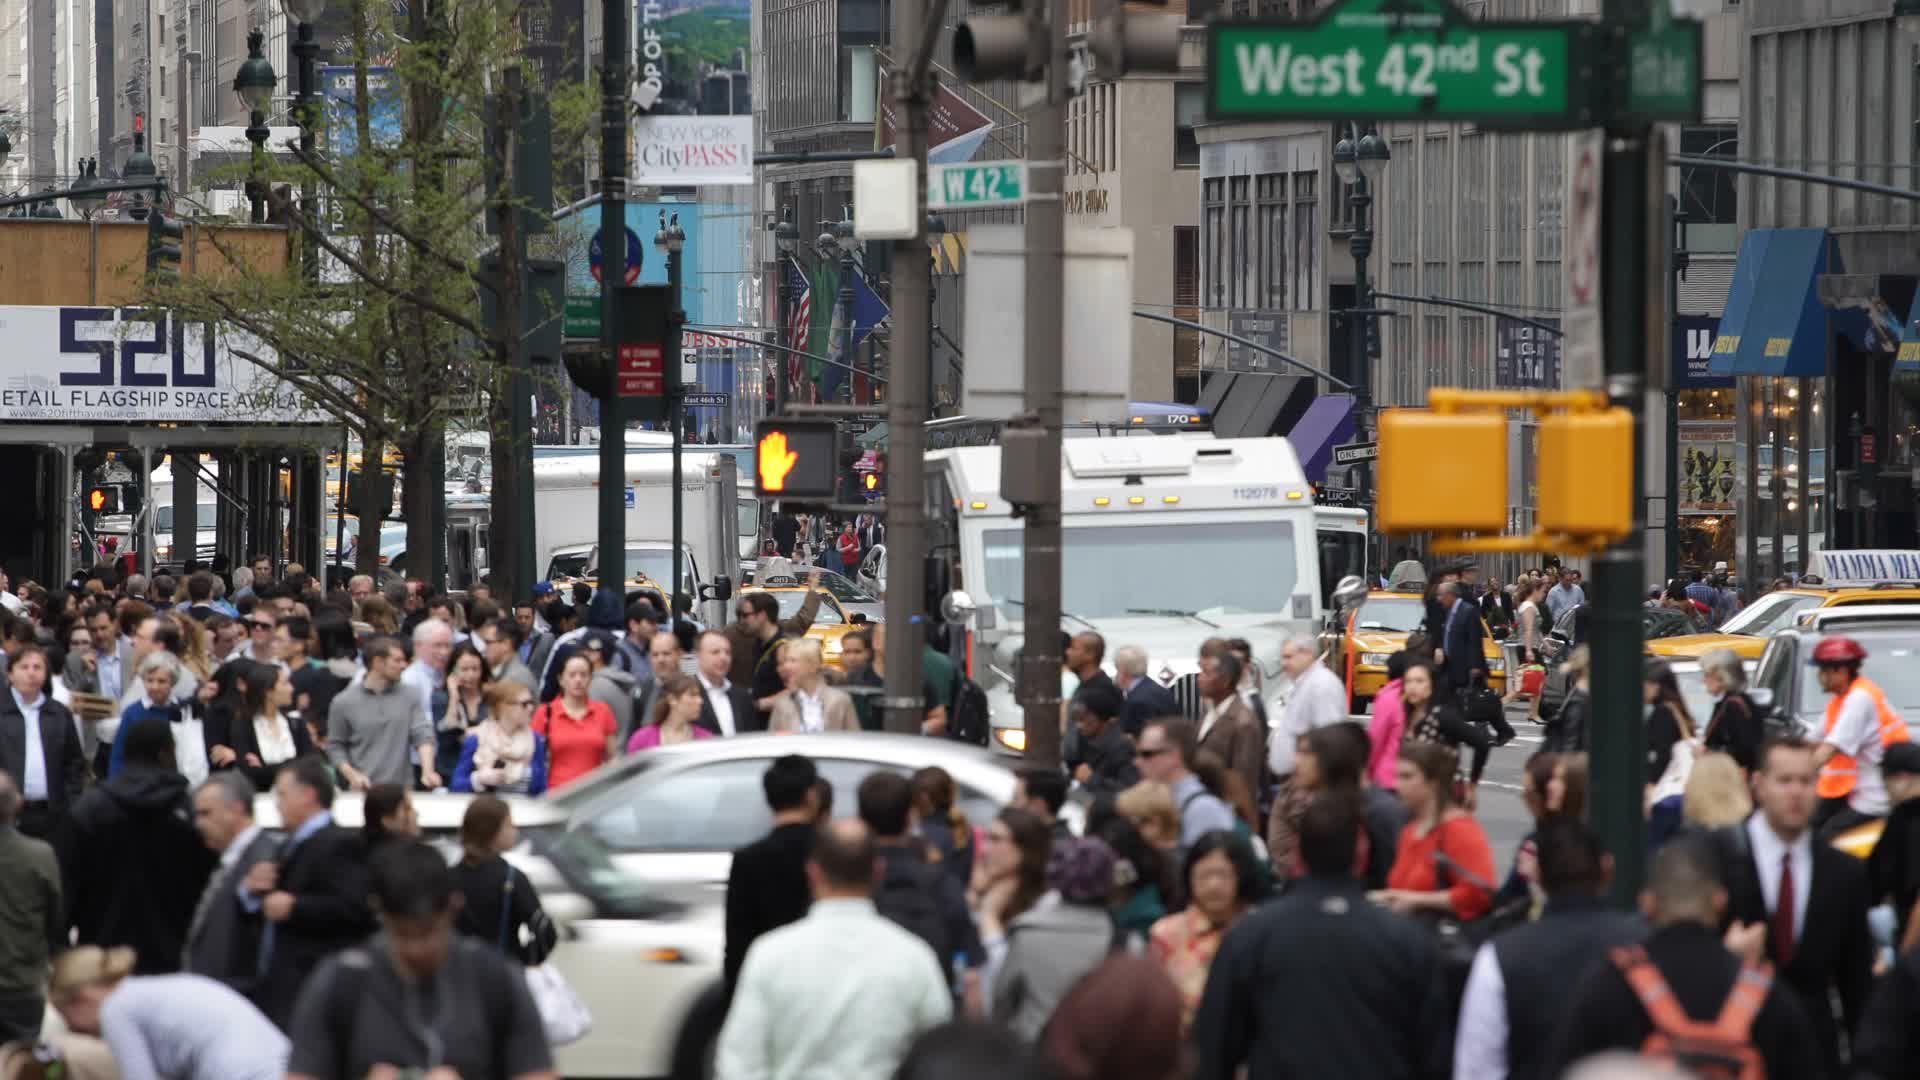 Nyc Busy Street Traffic Crowd Pedestrian People Crossing Street